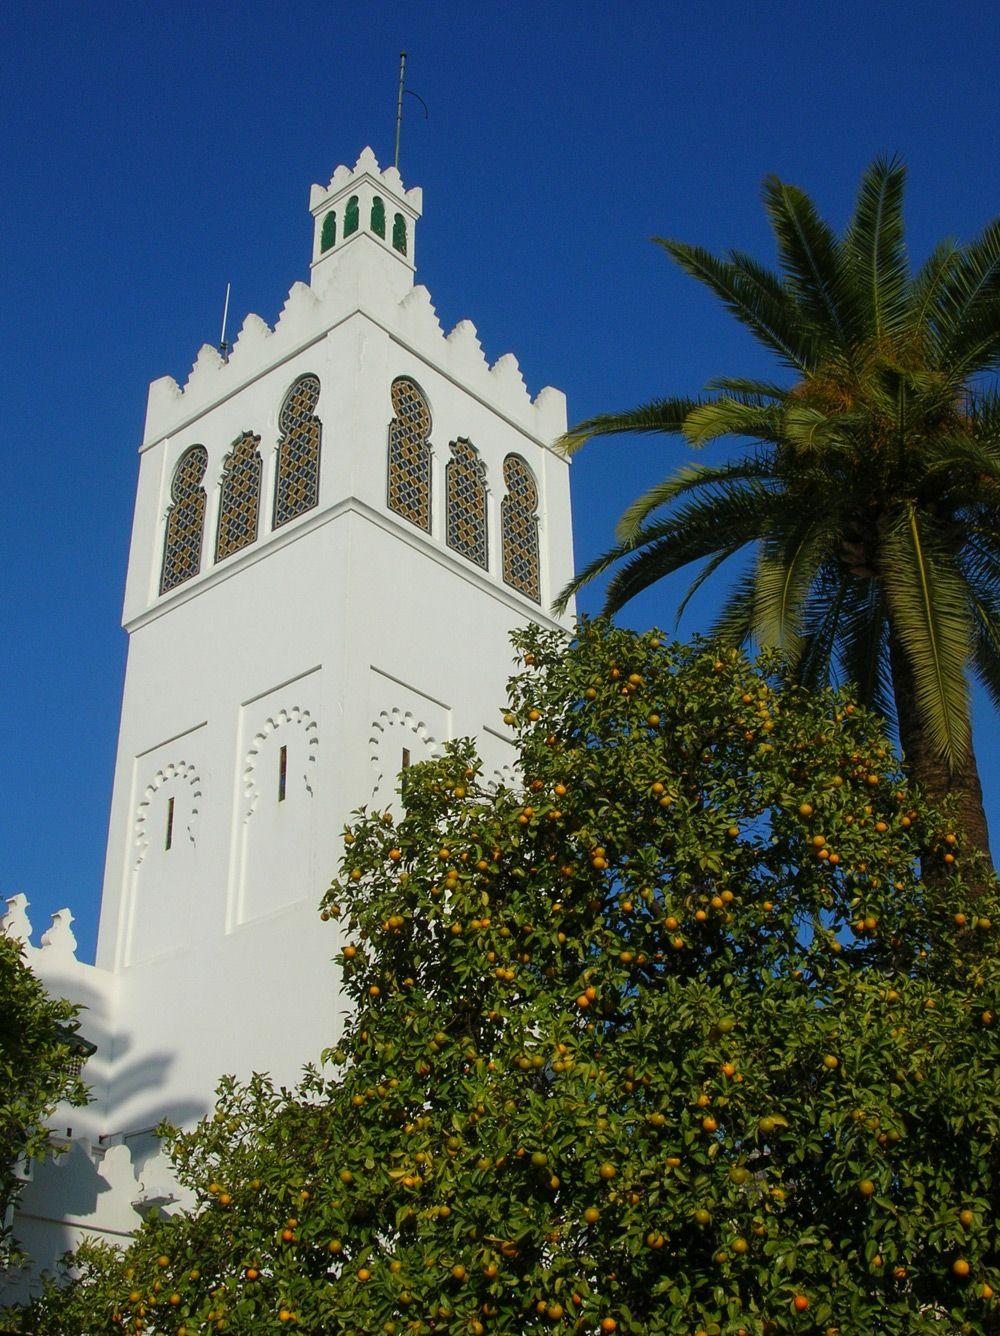 Torre del pabellón de Marrruecos de la expo de 1929, Sevilla